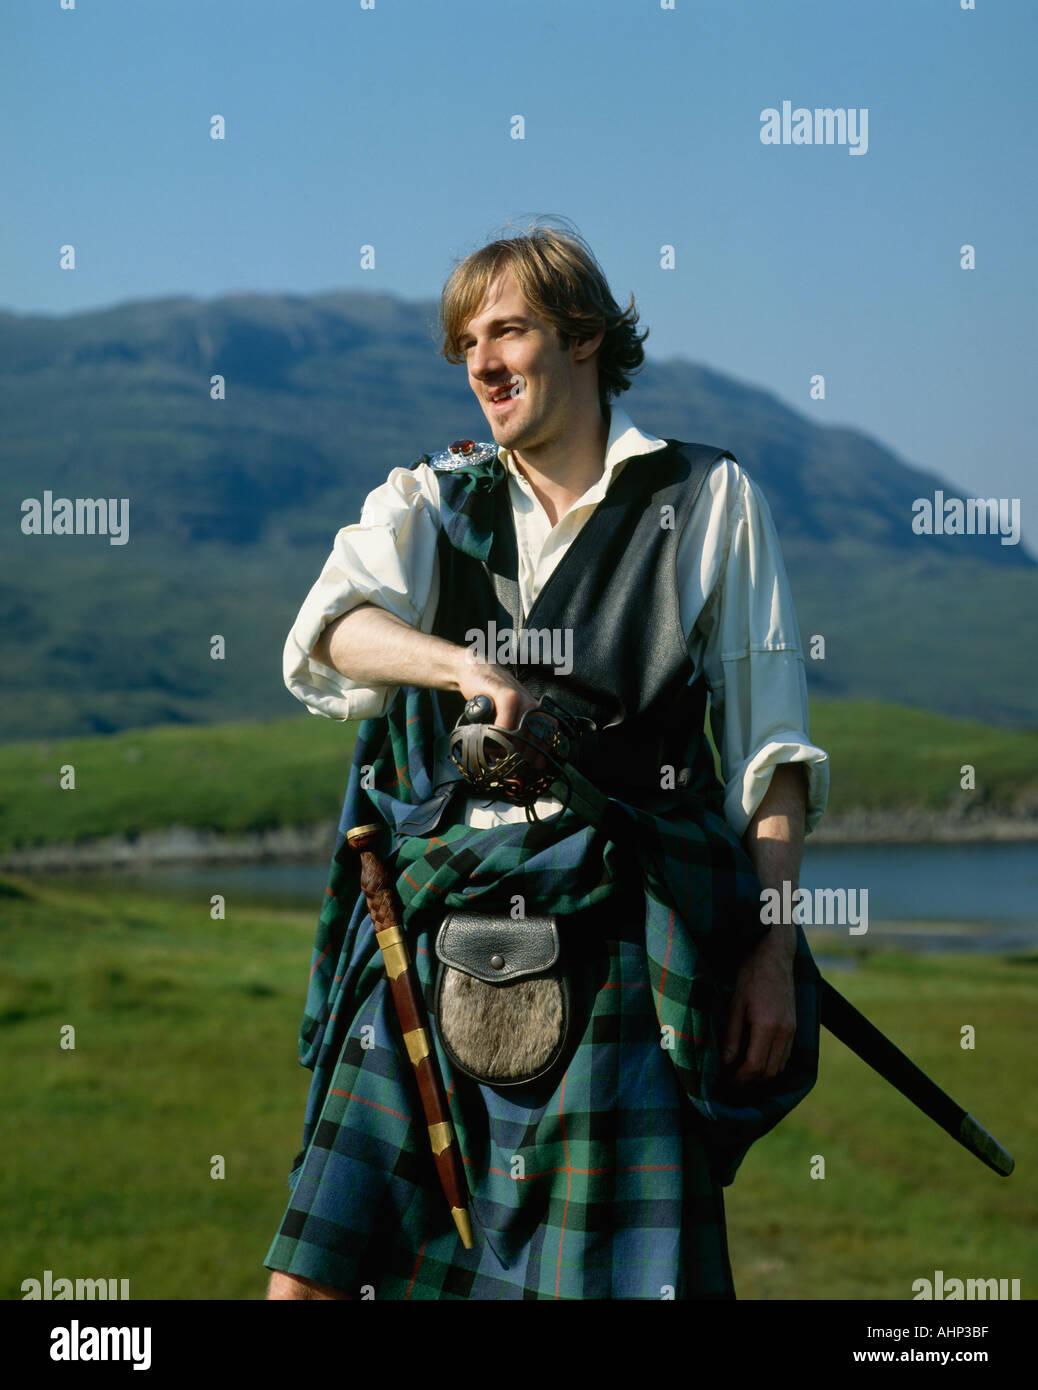 Highlander Loch Assynt Highlands Scotland - Stock Image